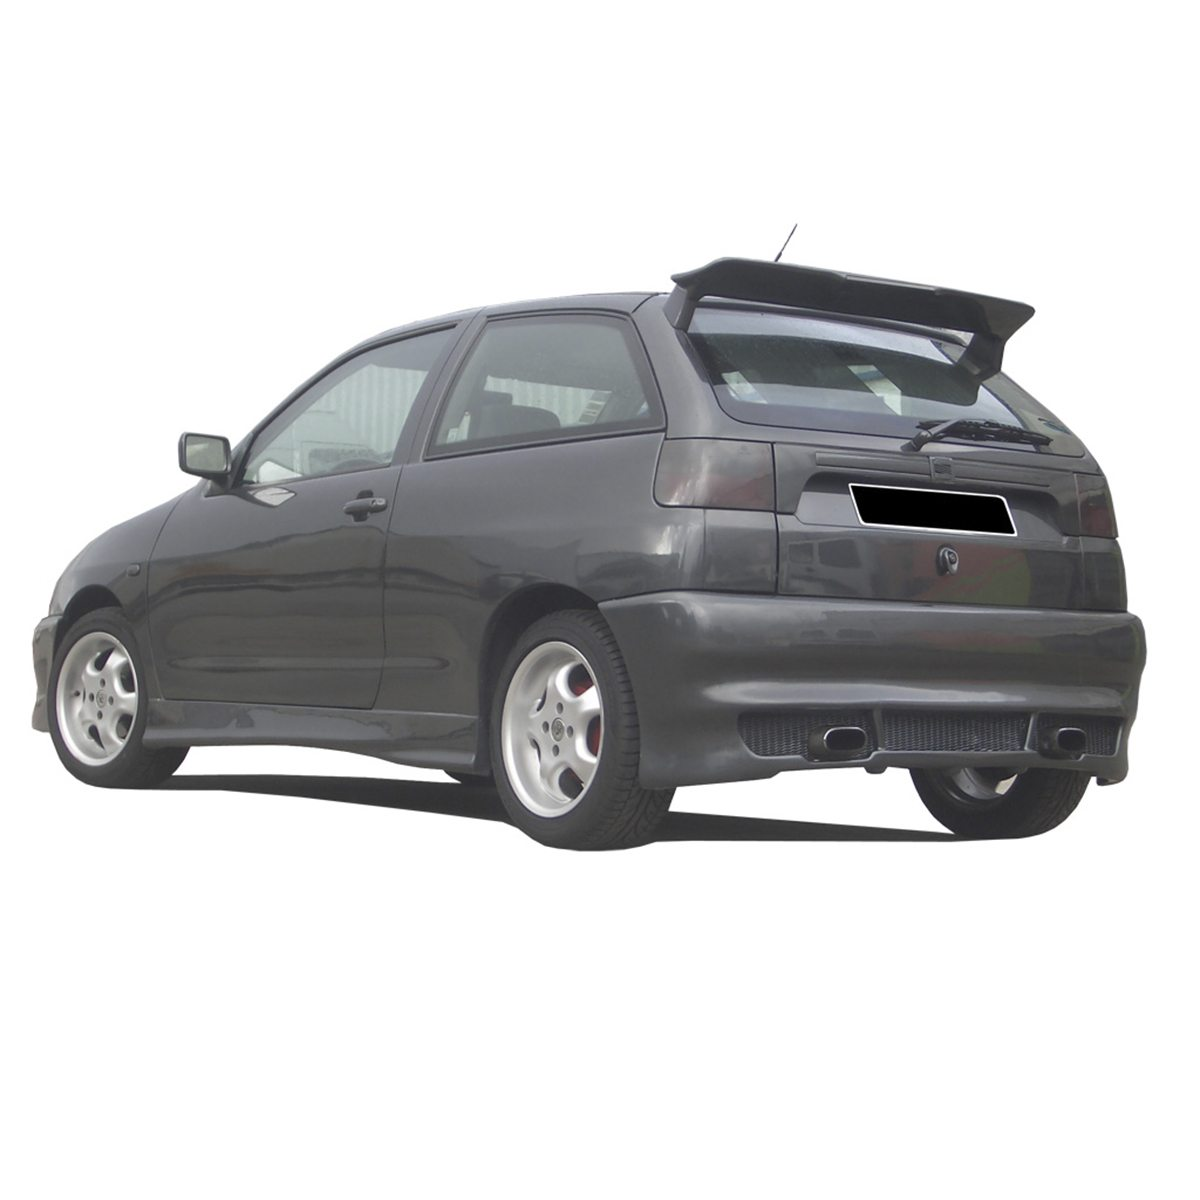 Seat-Ibiza-93-Open-Tras-PCU0990